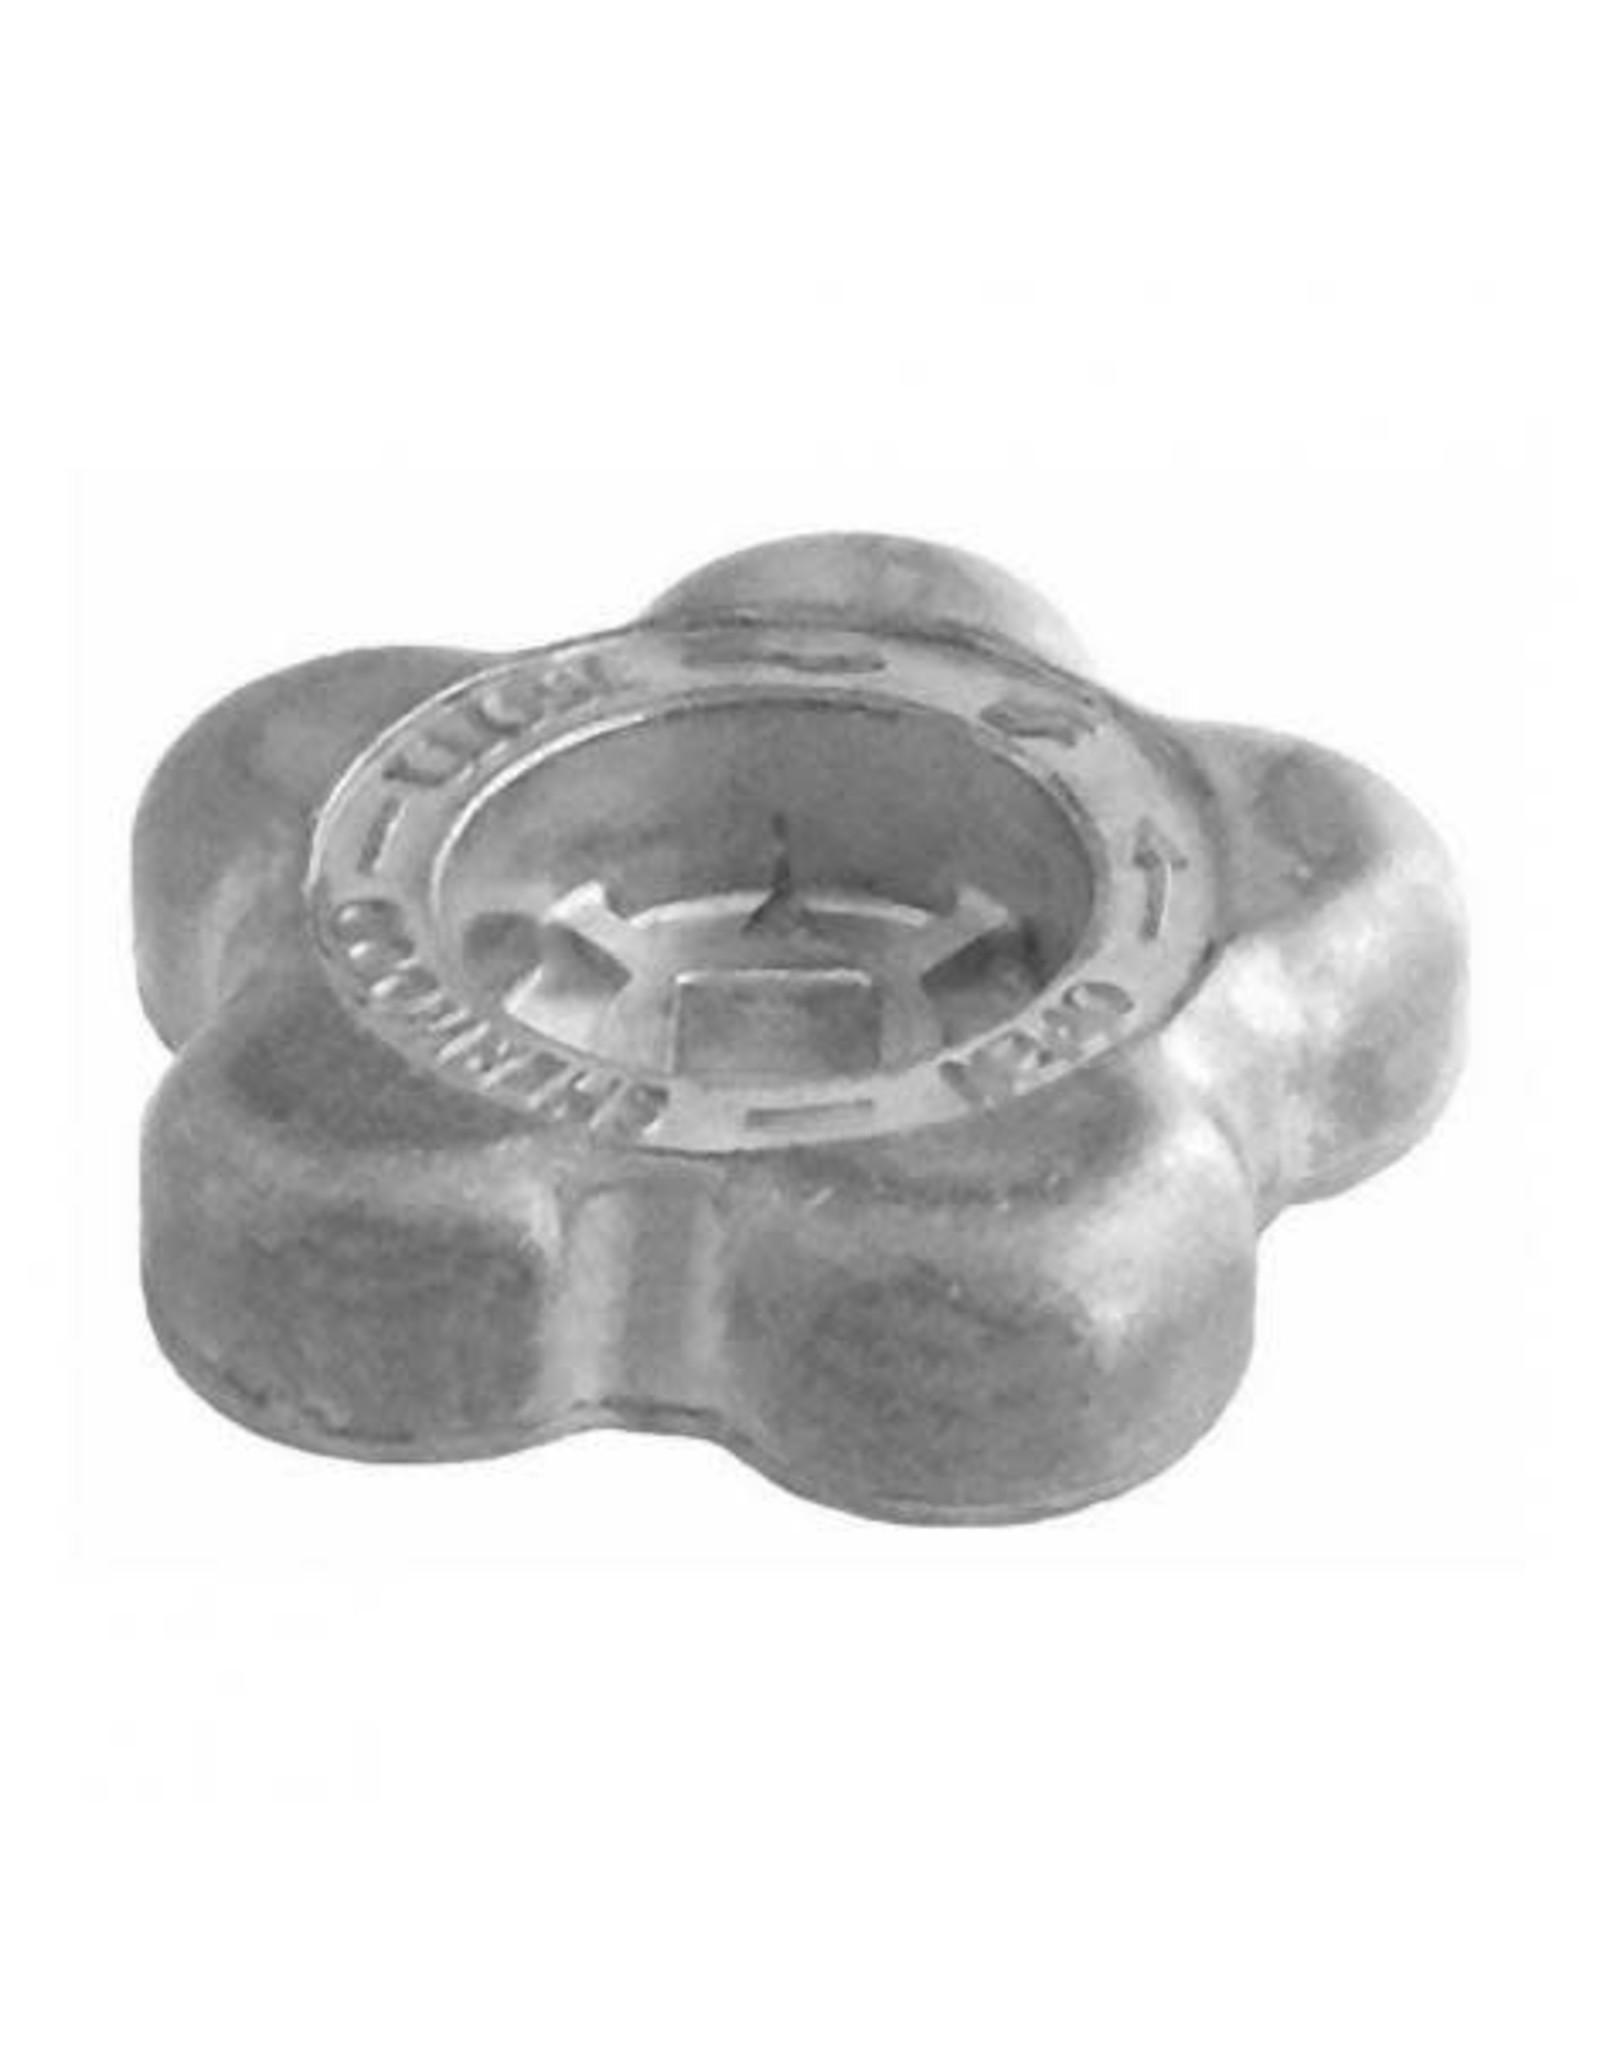 CO2 Tank Handwheel (metal)